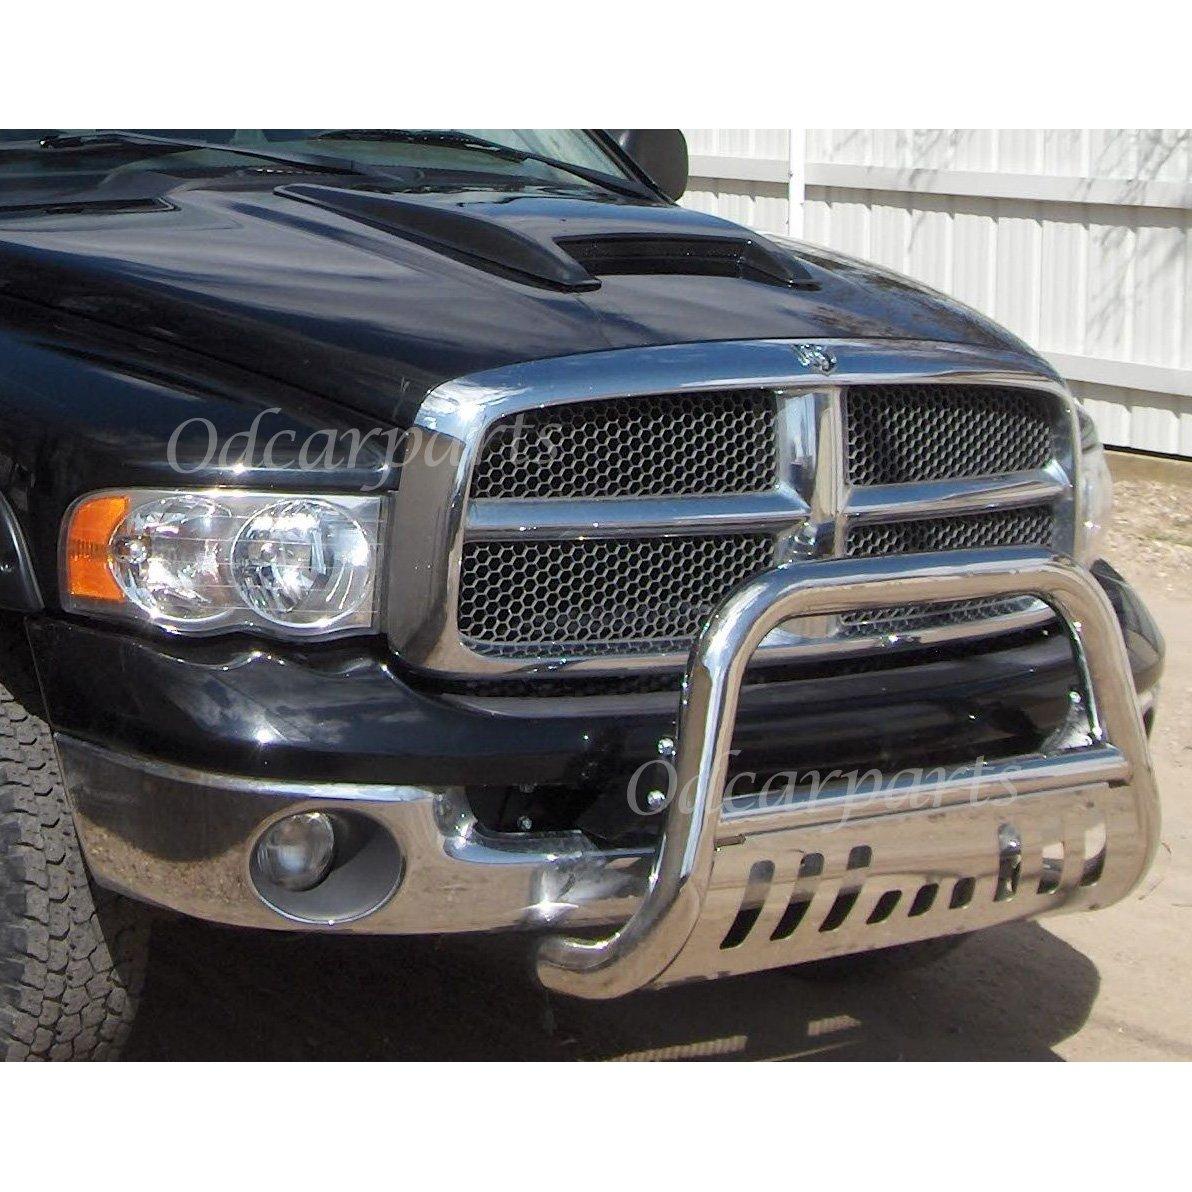 VioGi Fit 06-08 Dodge Ram 1500 Pickup 3 S//S Tube Bull Bar Brush Push Bumper Grille Grill Guard